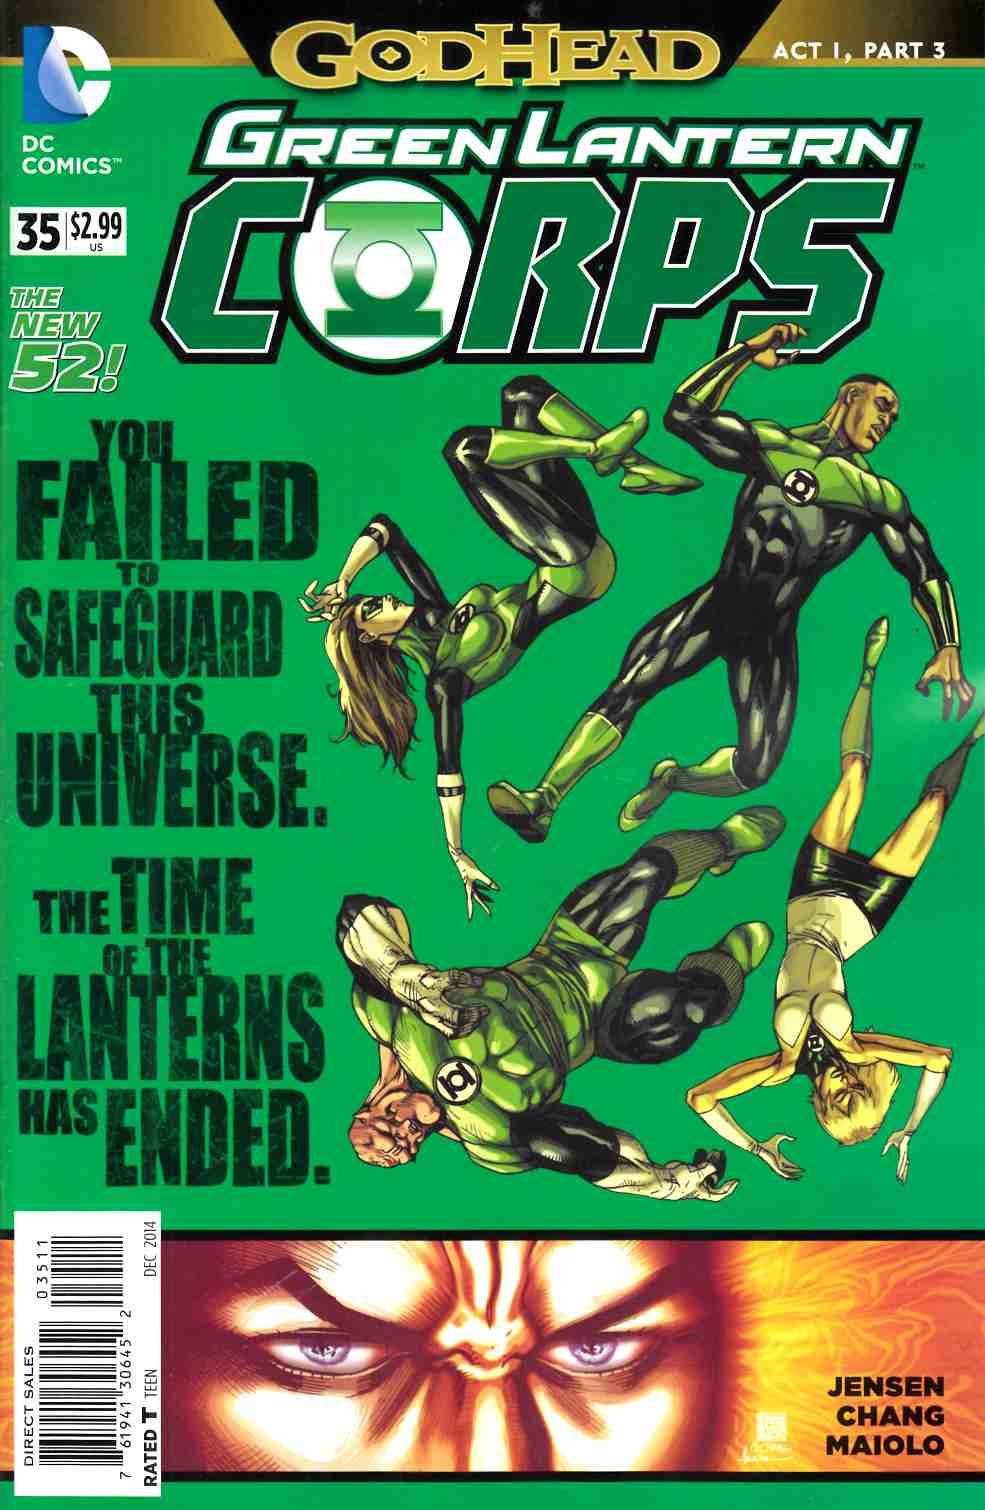 Green Lantern Corps #35 (Godhead) [DC Comic]